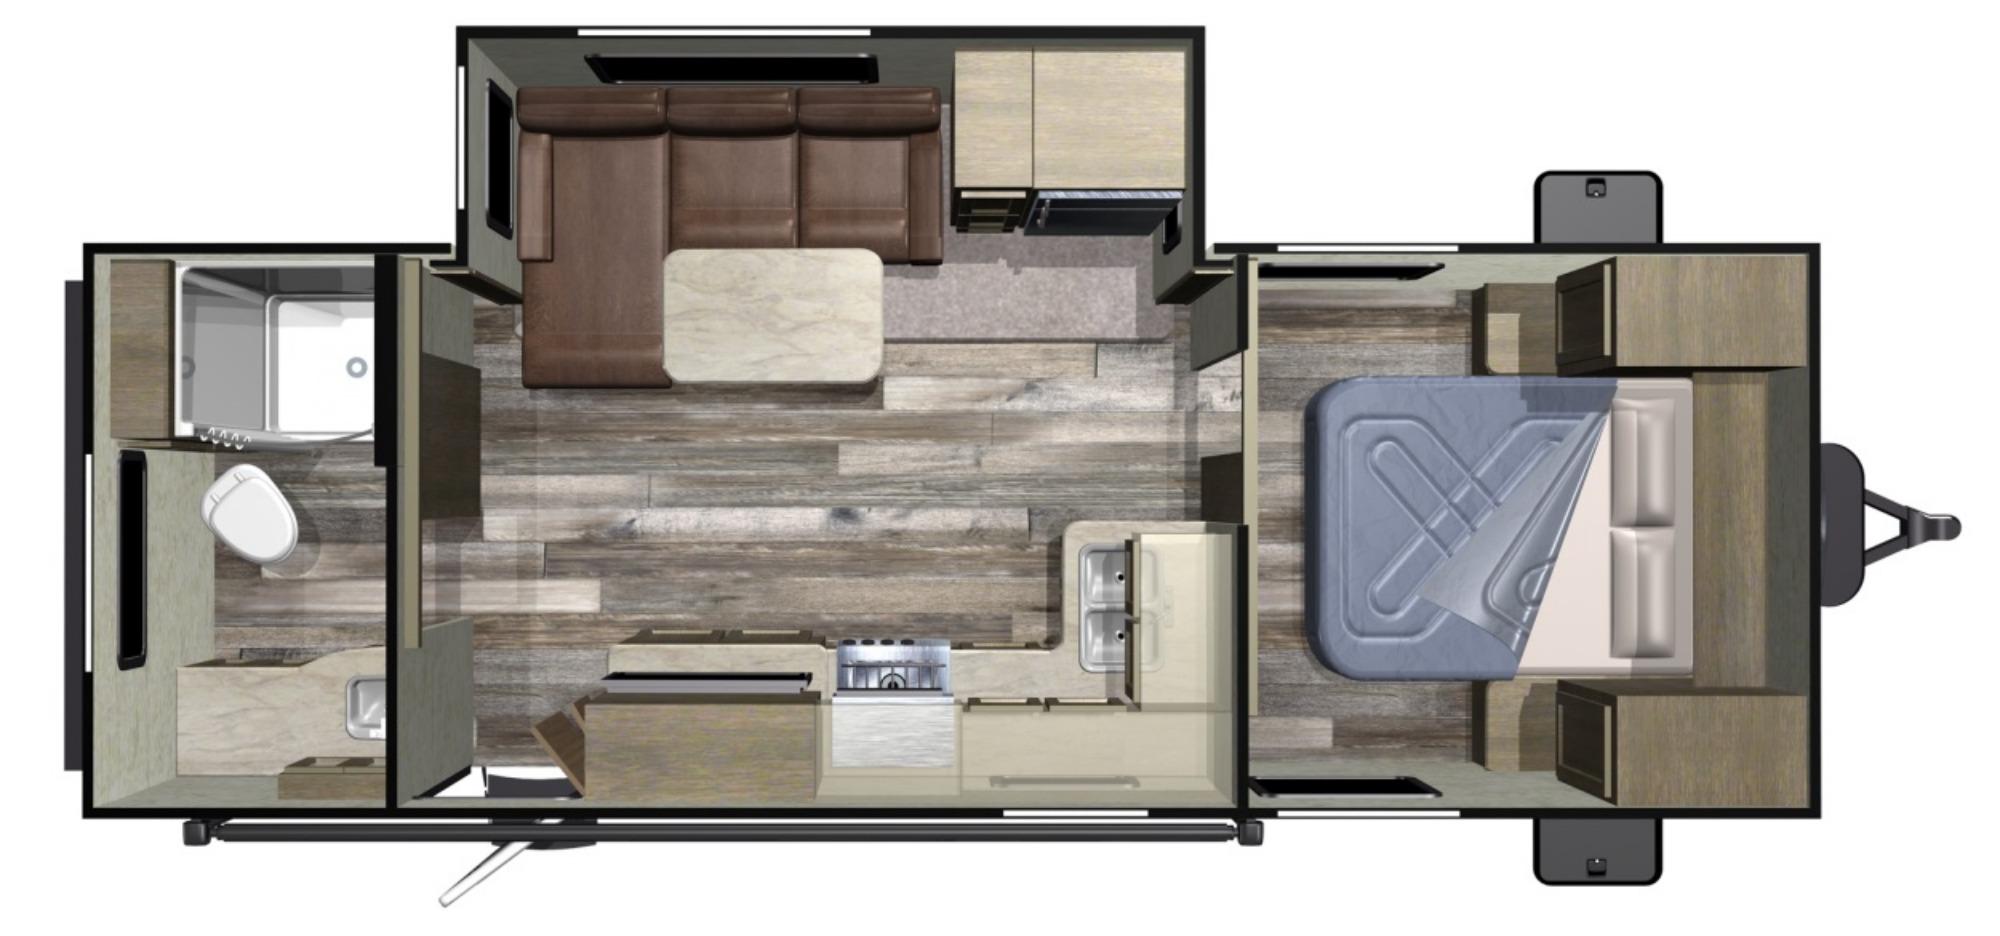 View Floor Plan for 2020 STARCRAFT AUTUMN RIDGE OUTFITTER 21RBS